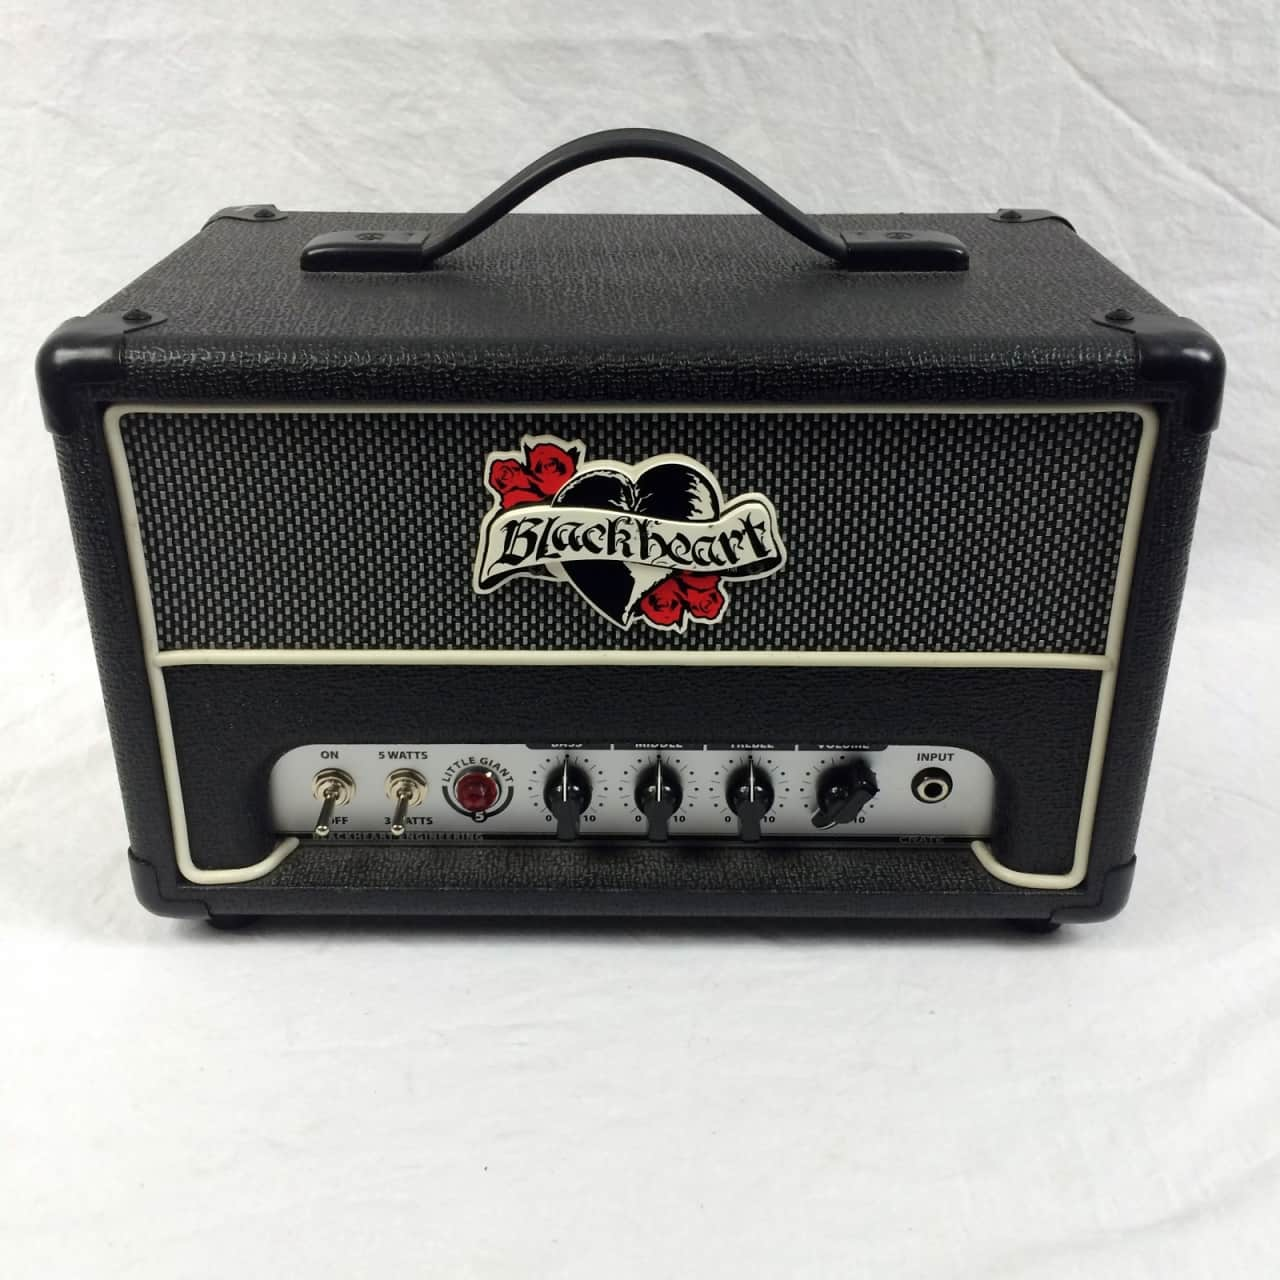 5w Tube Amp : blackheart bh5h little giant 5w tube guitar amp head reverb ~ Russianpoet.info Haus und Dekorationen